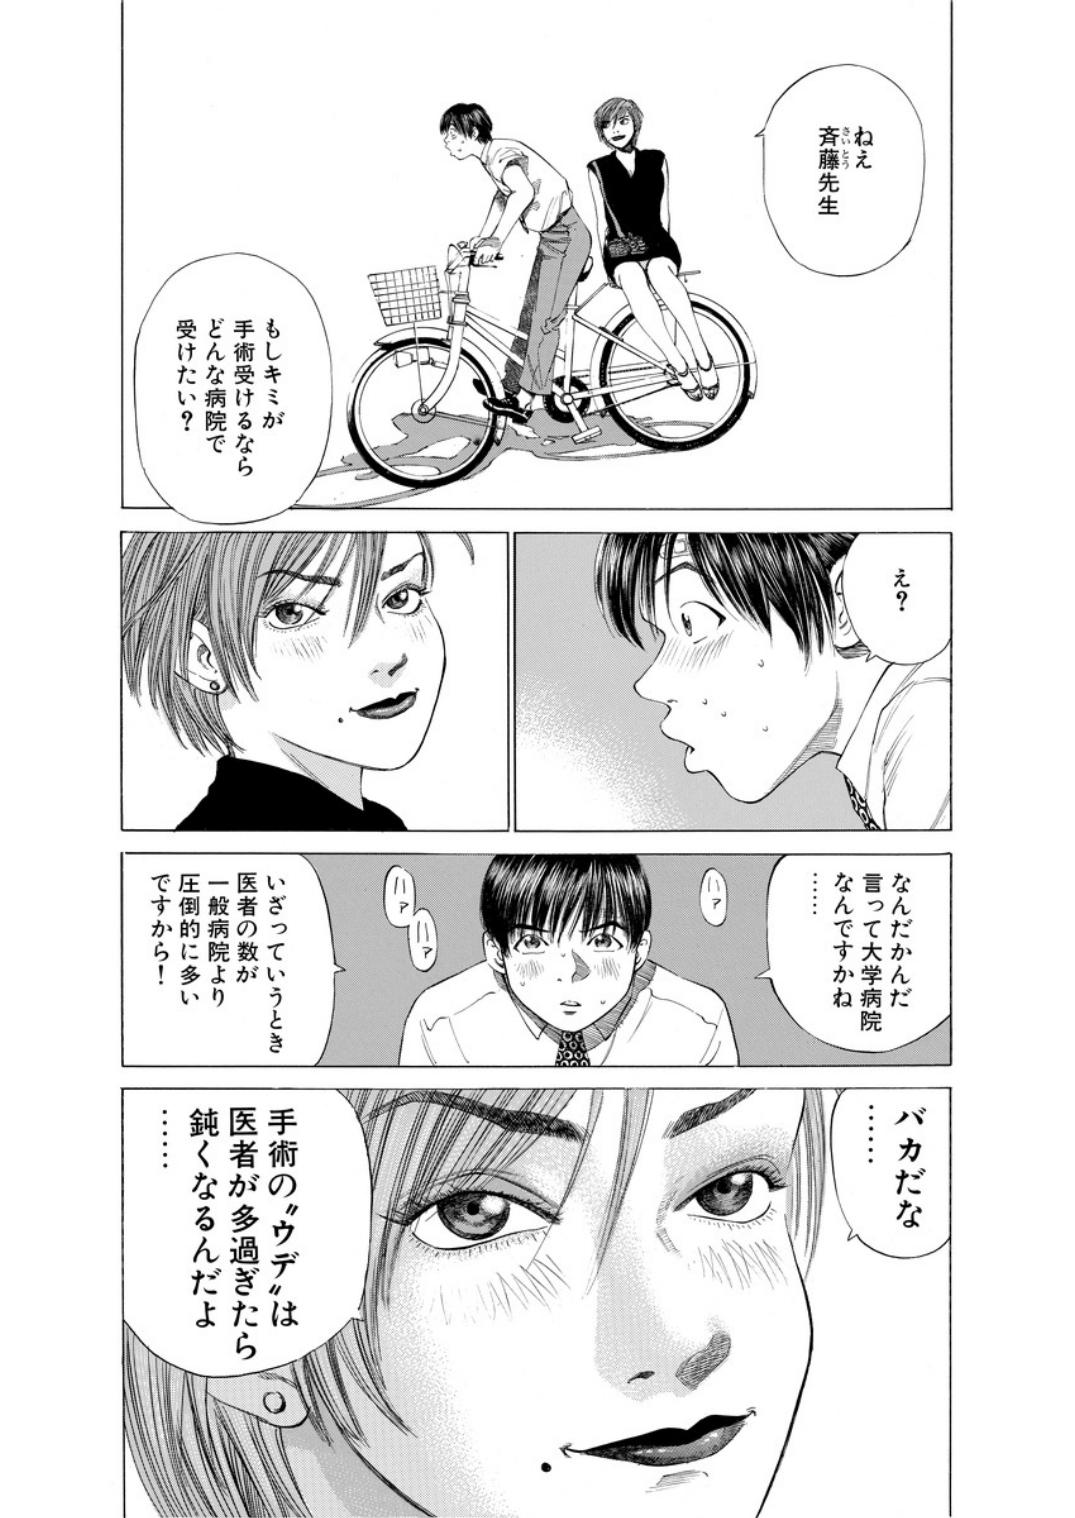 001bj_page-0205.jpg